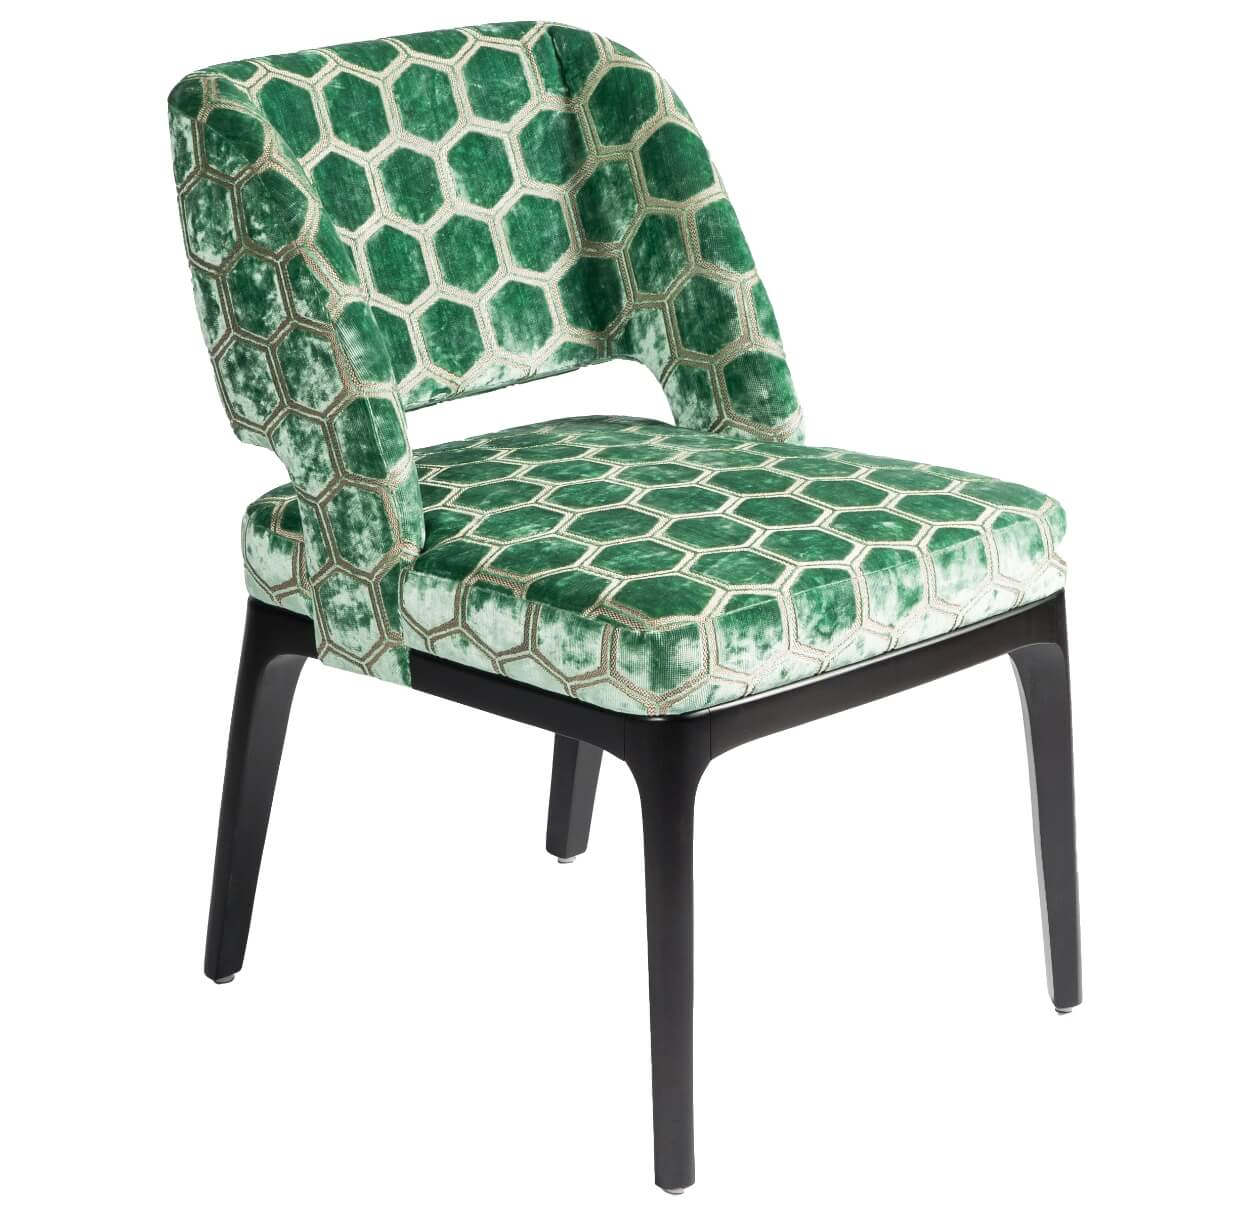 Manga fauteuil Mulleman meubelen